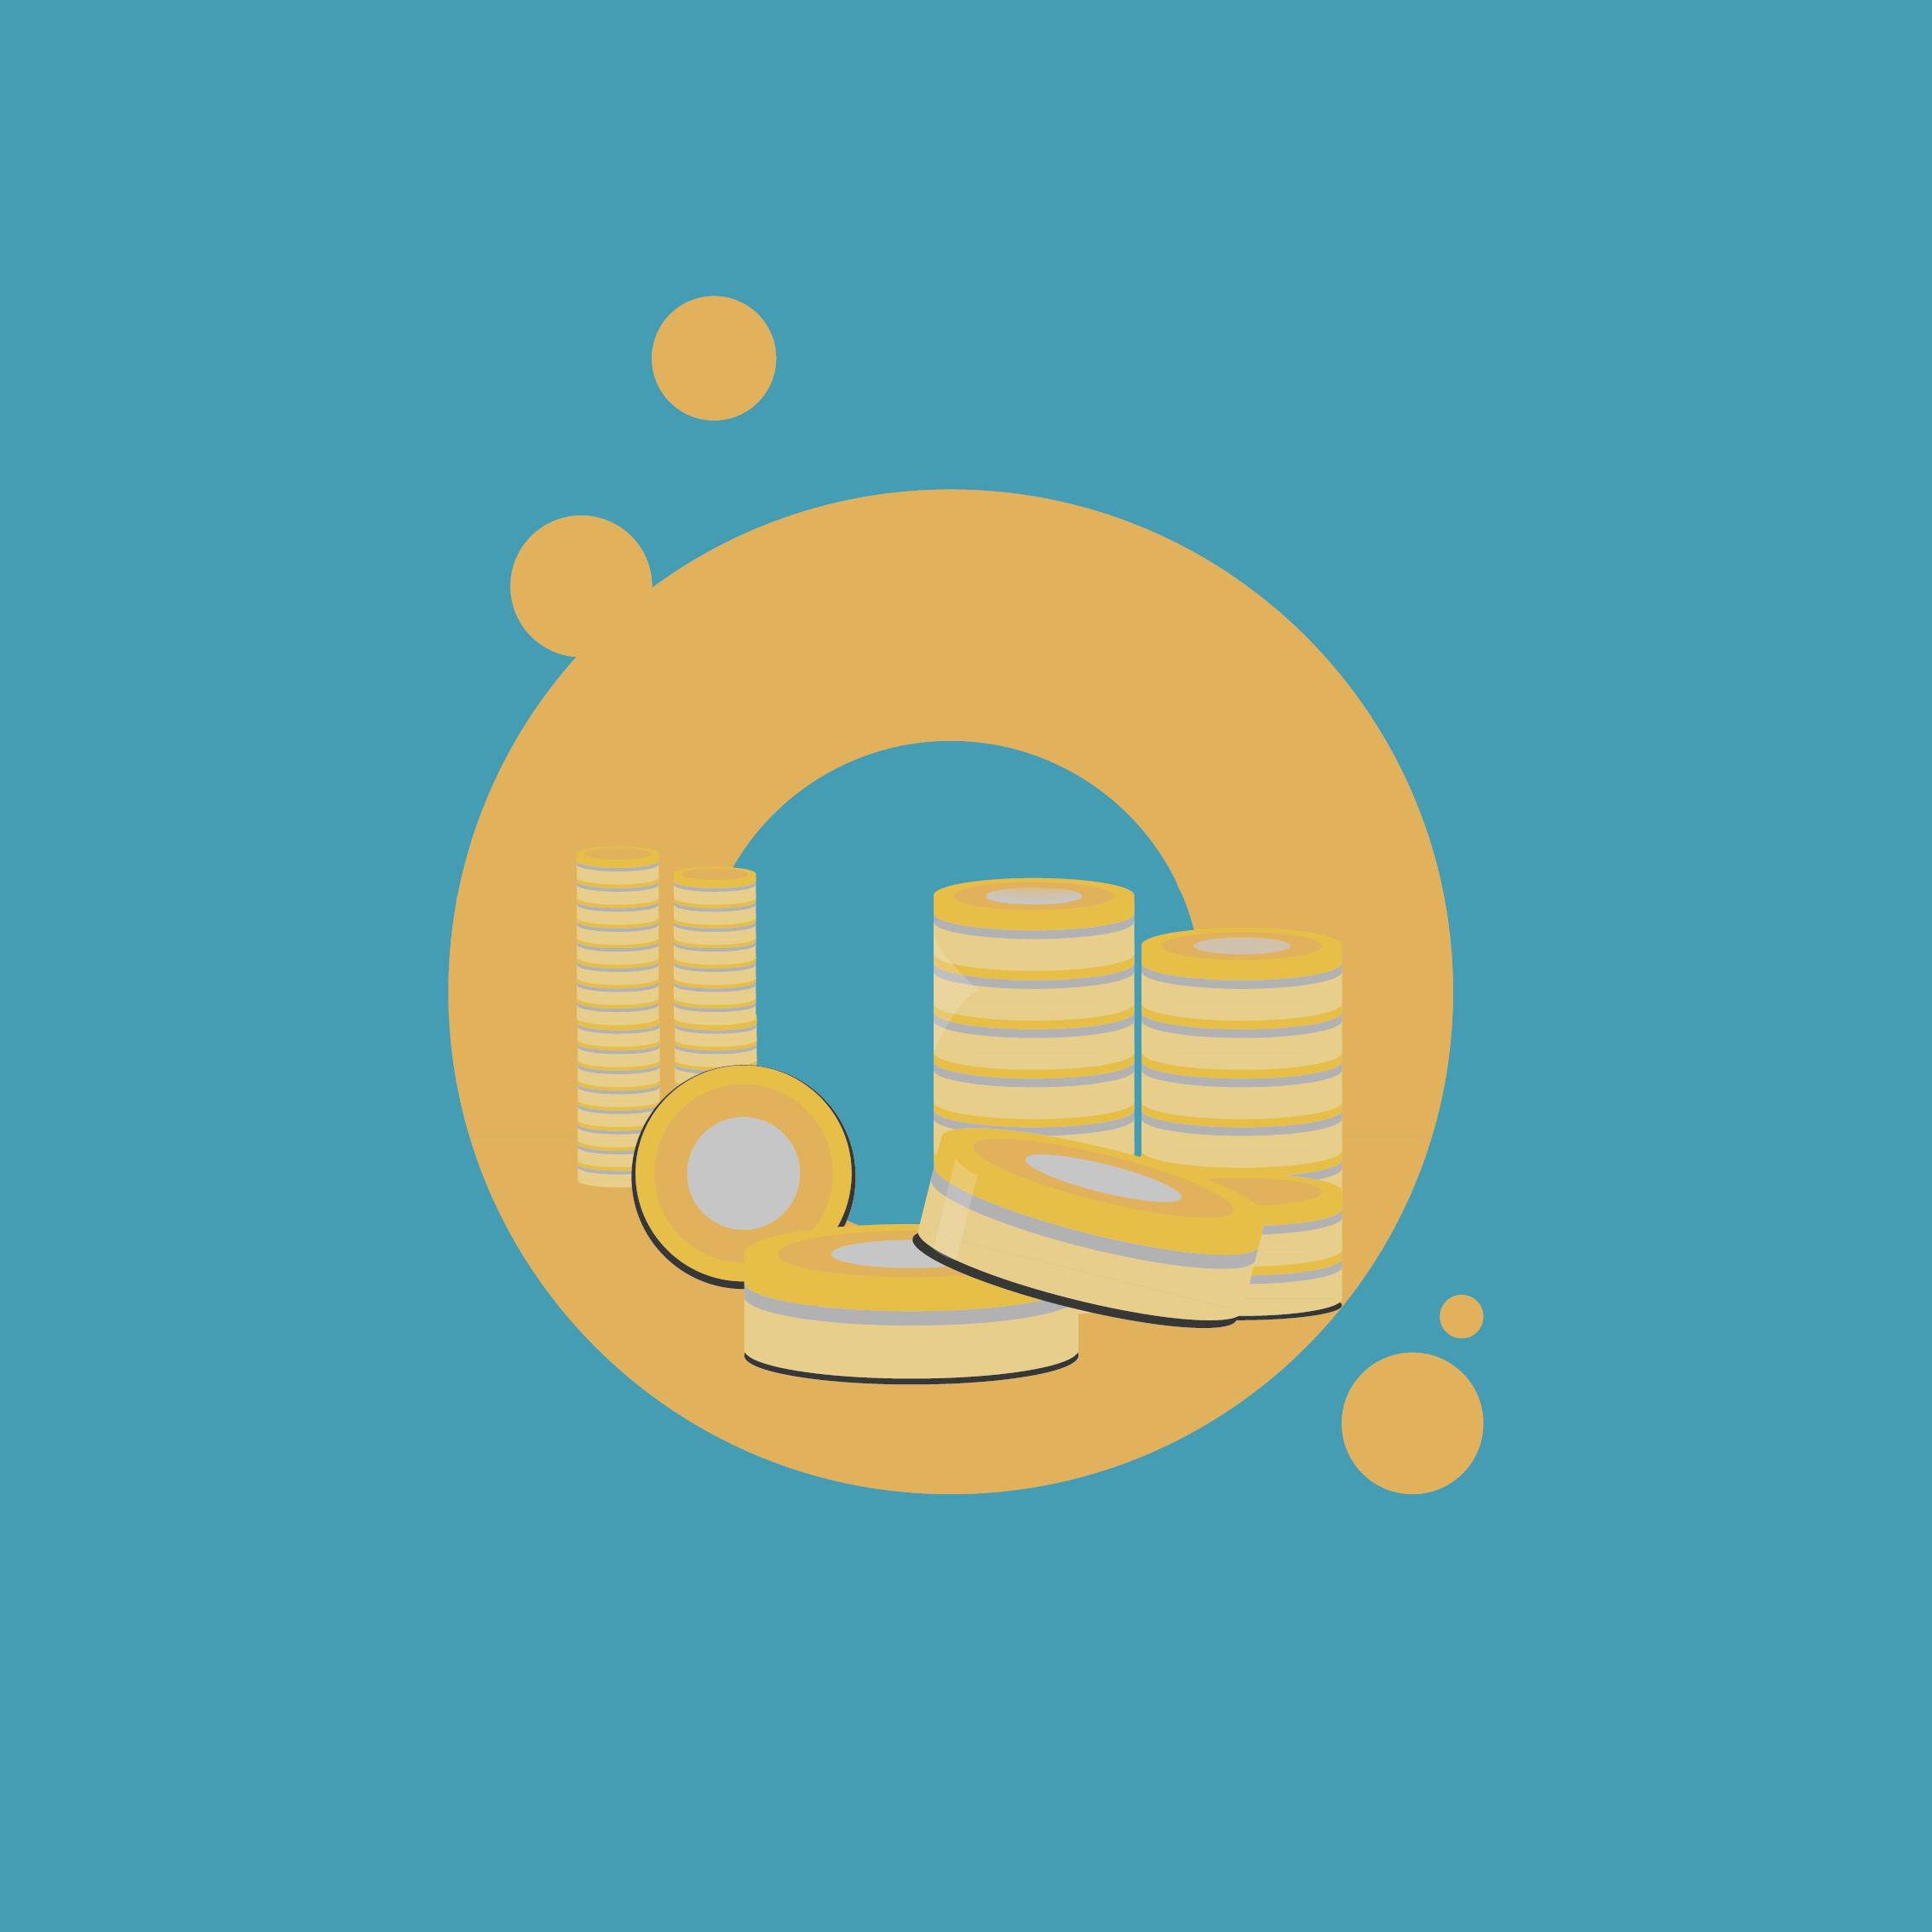 Golden Circle Simon Sinek Logo Blog Why How What